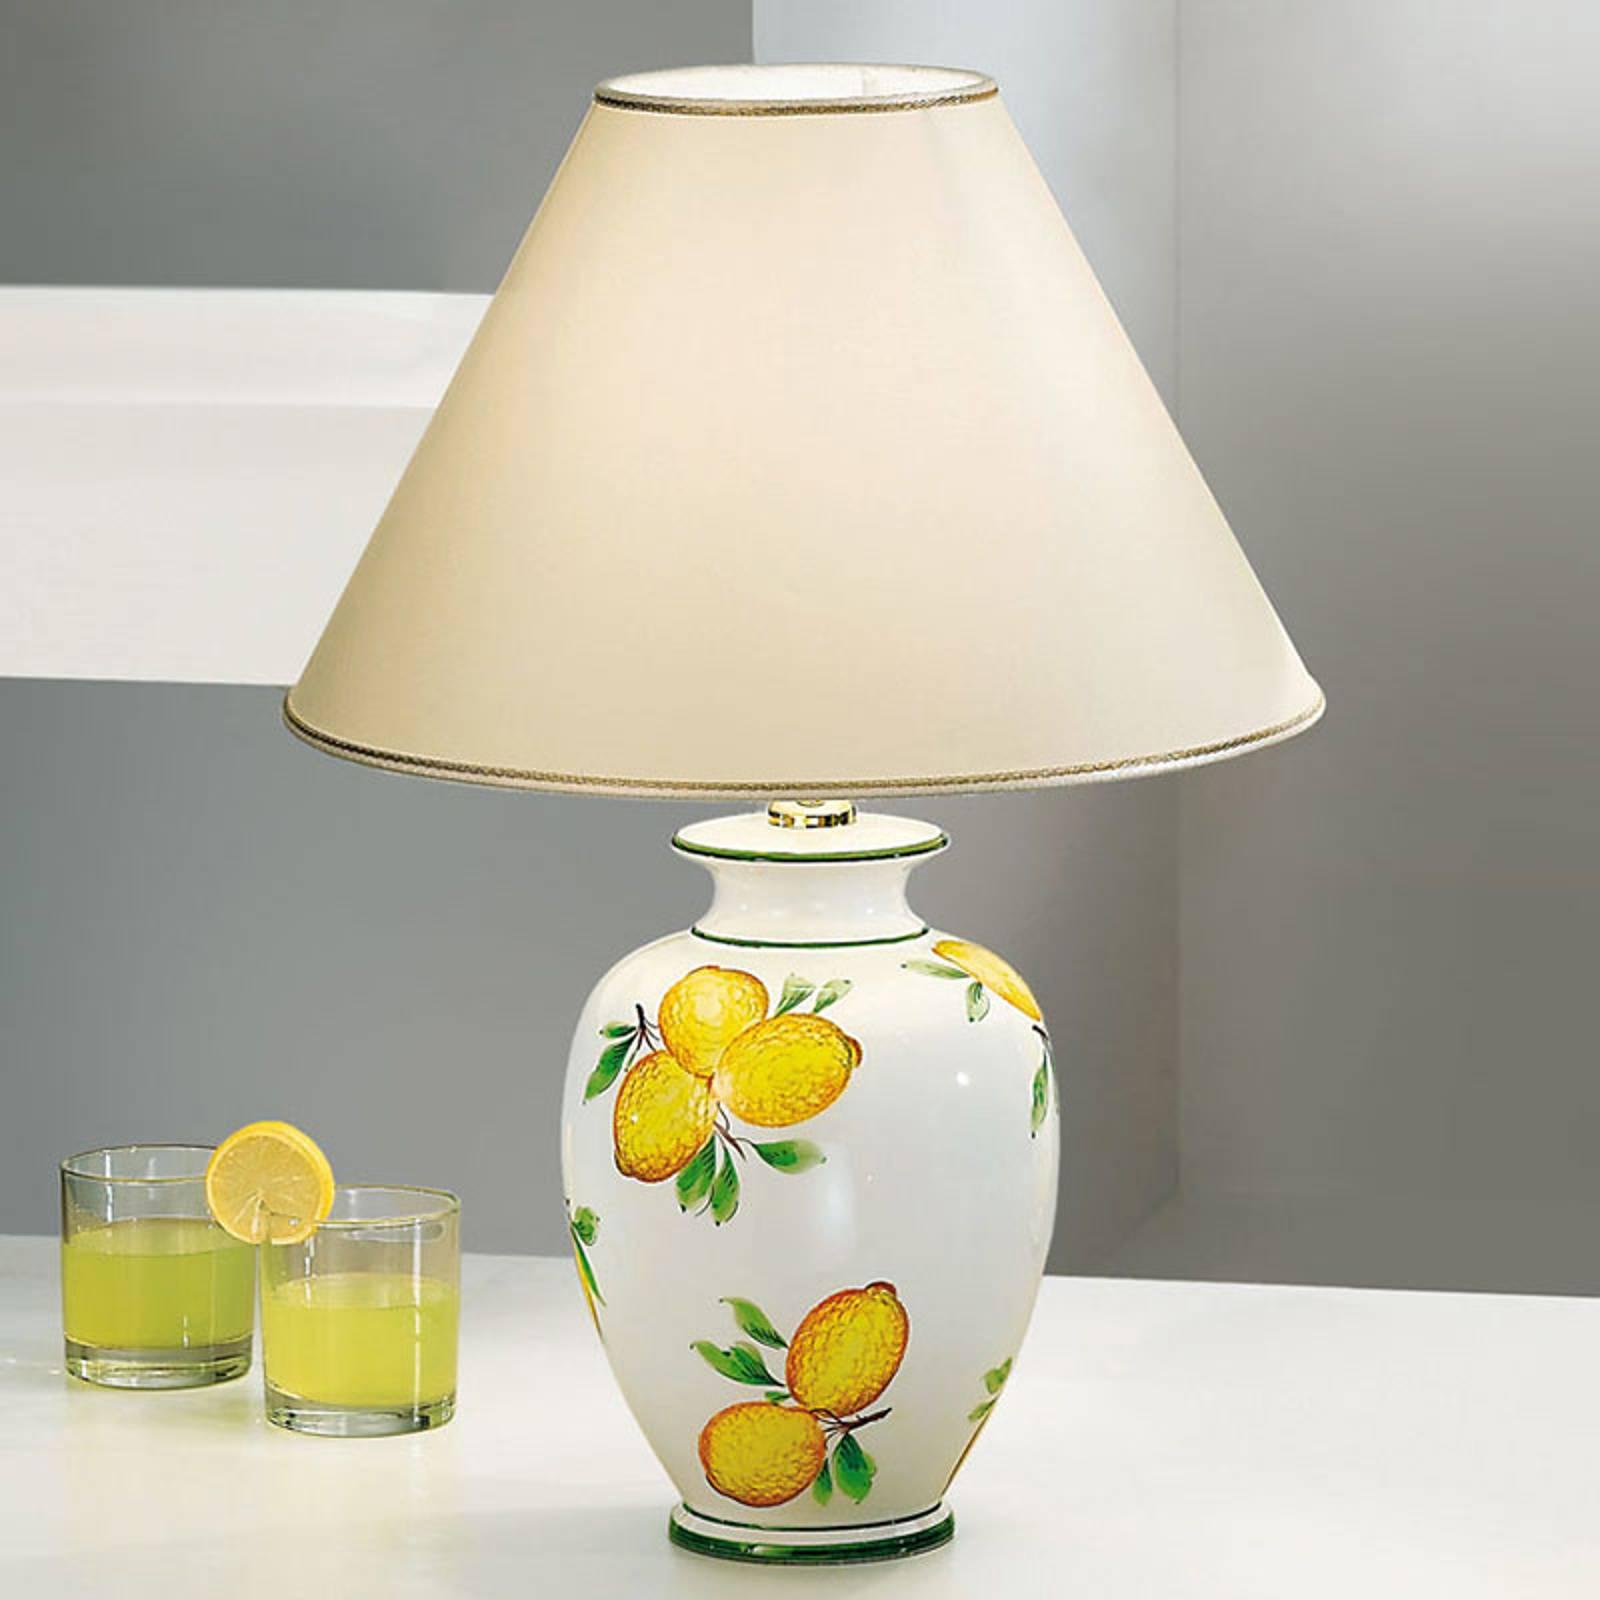 Pöytävalaisin Giardino Lemone, Ø 40 cm